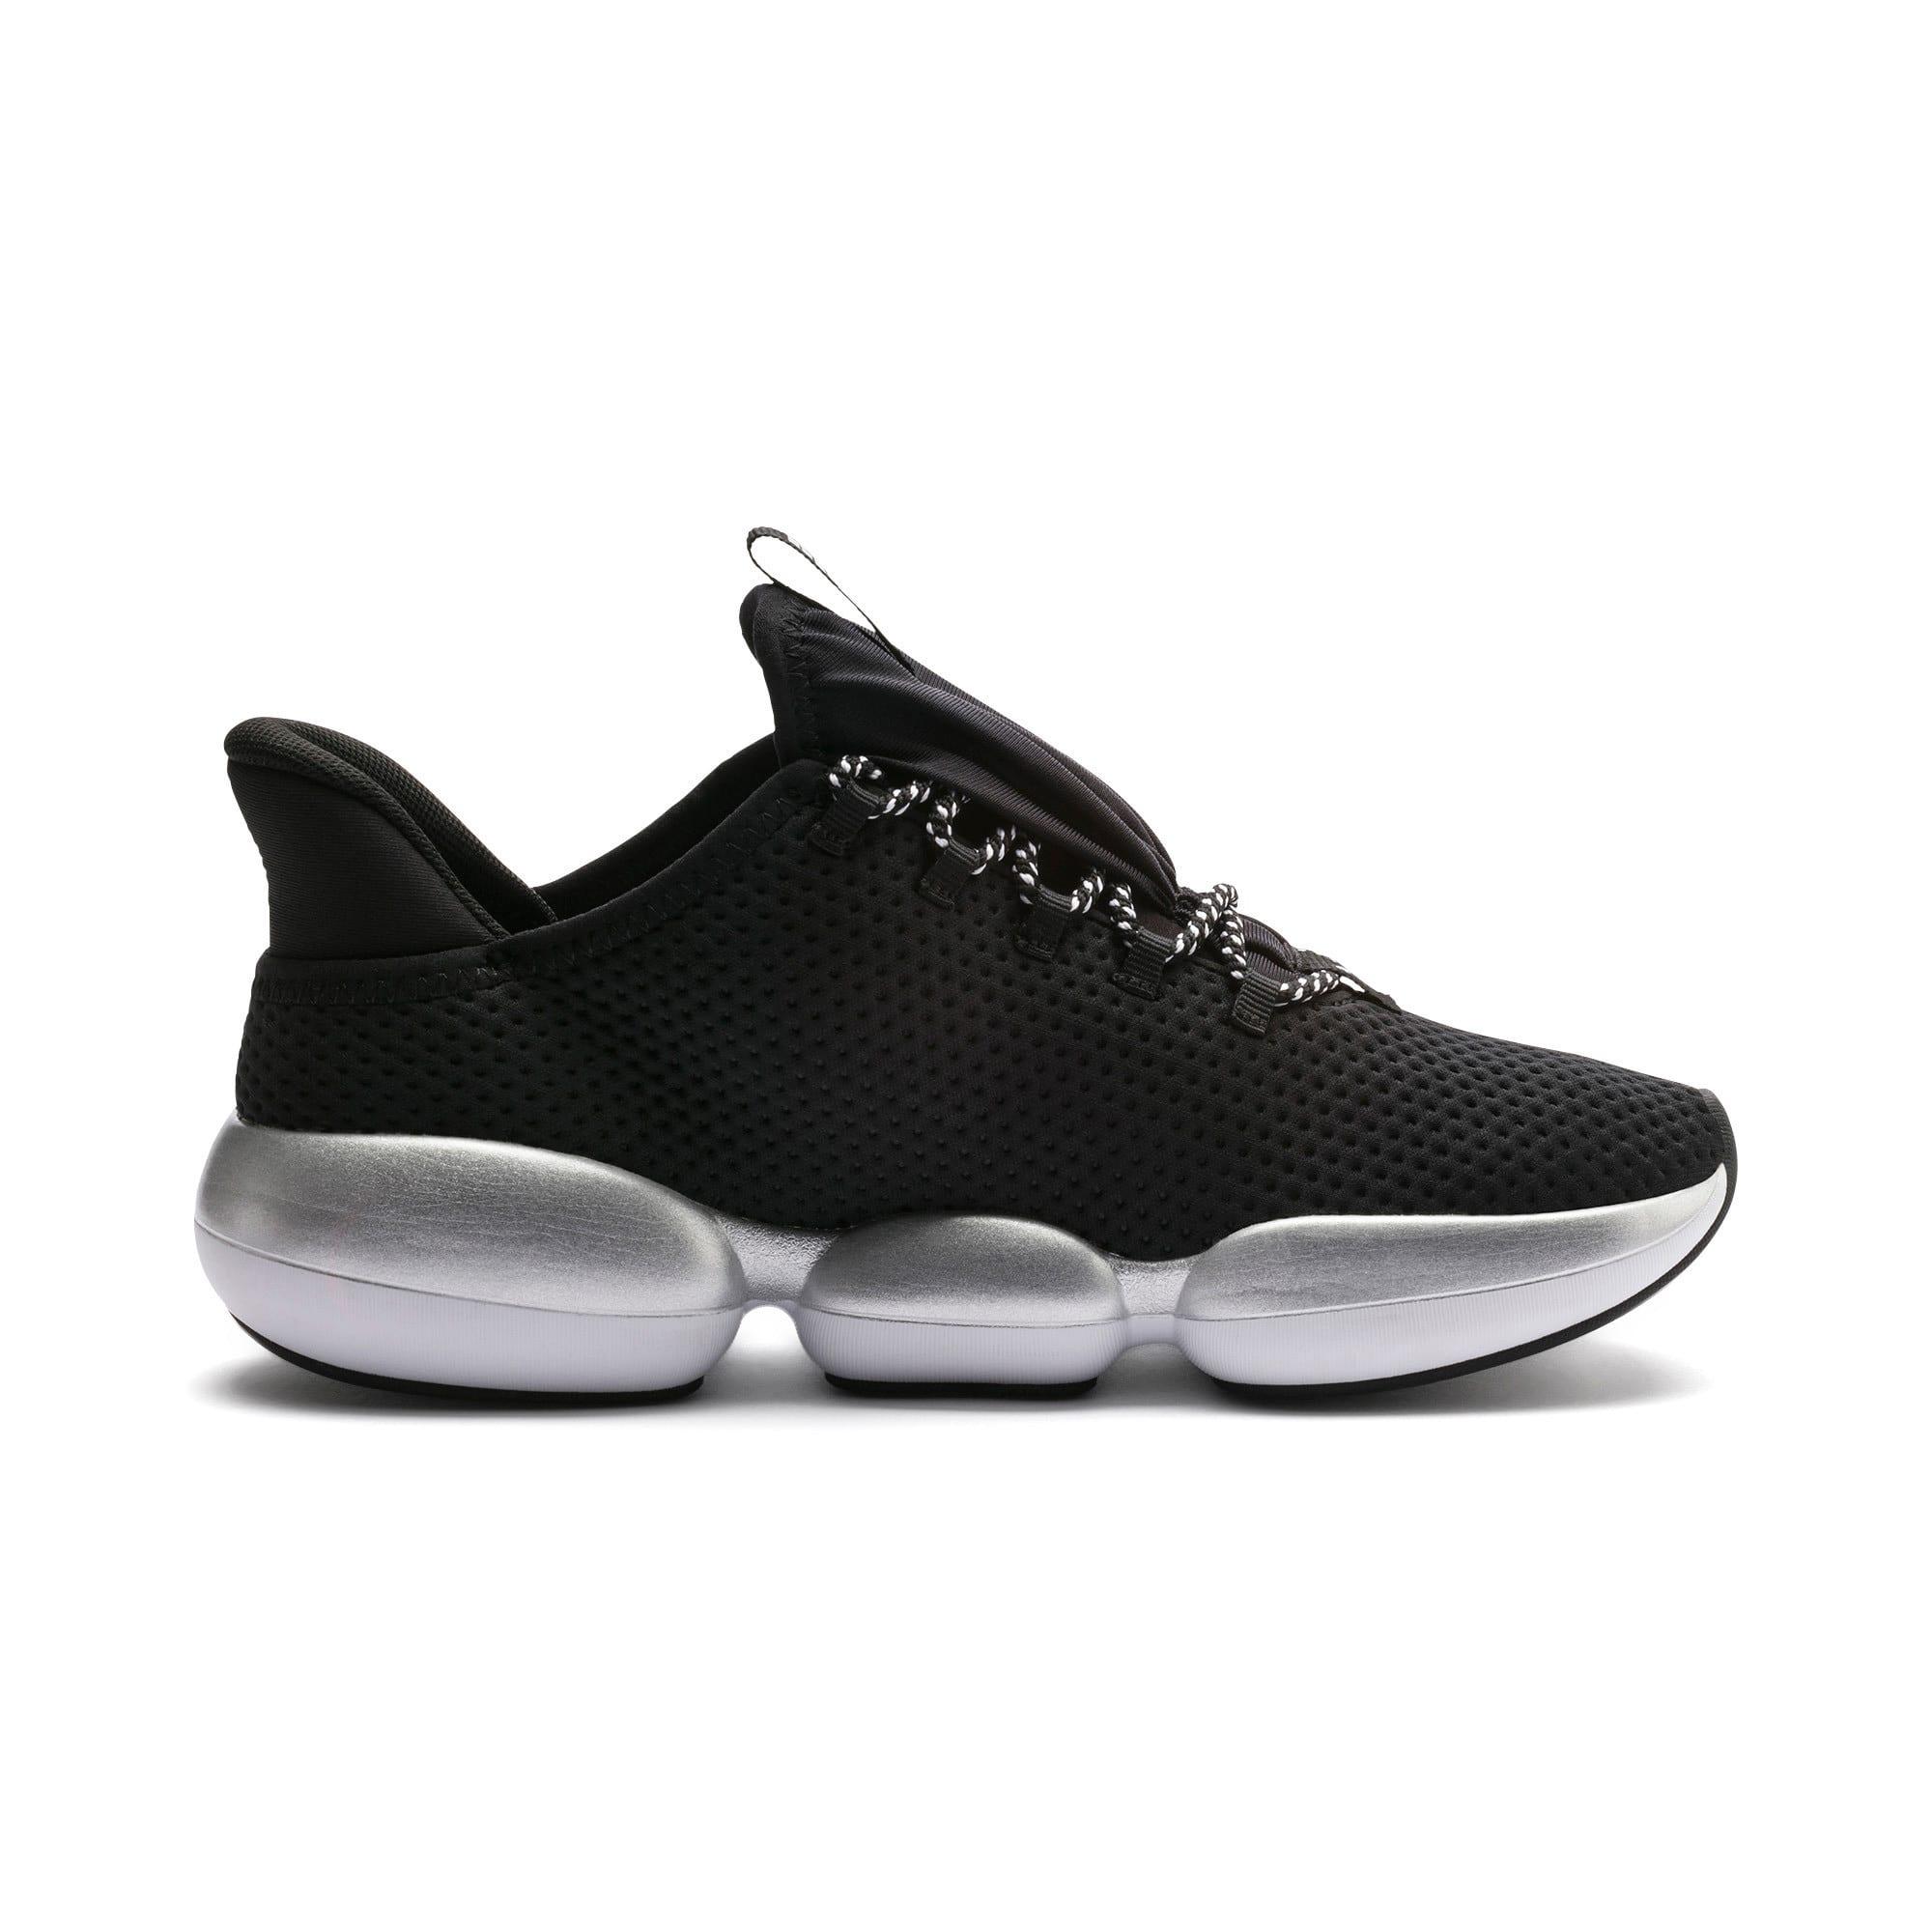 Thumbnail 6 of Mode XT Women's Training Shoes, Puma Black-Puma White, medium